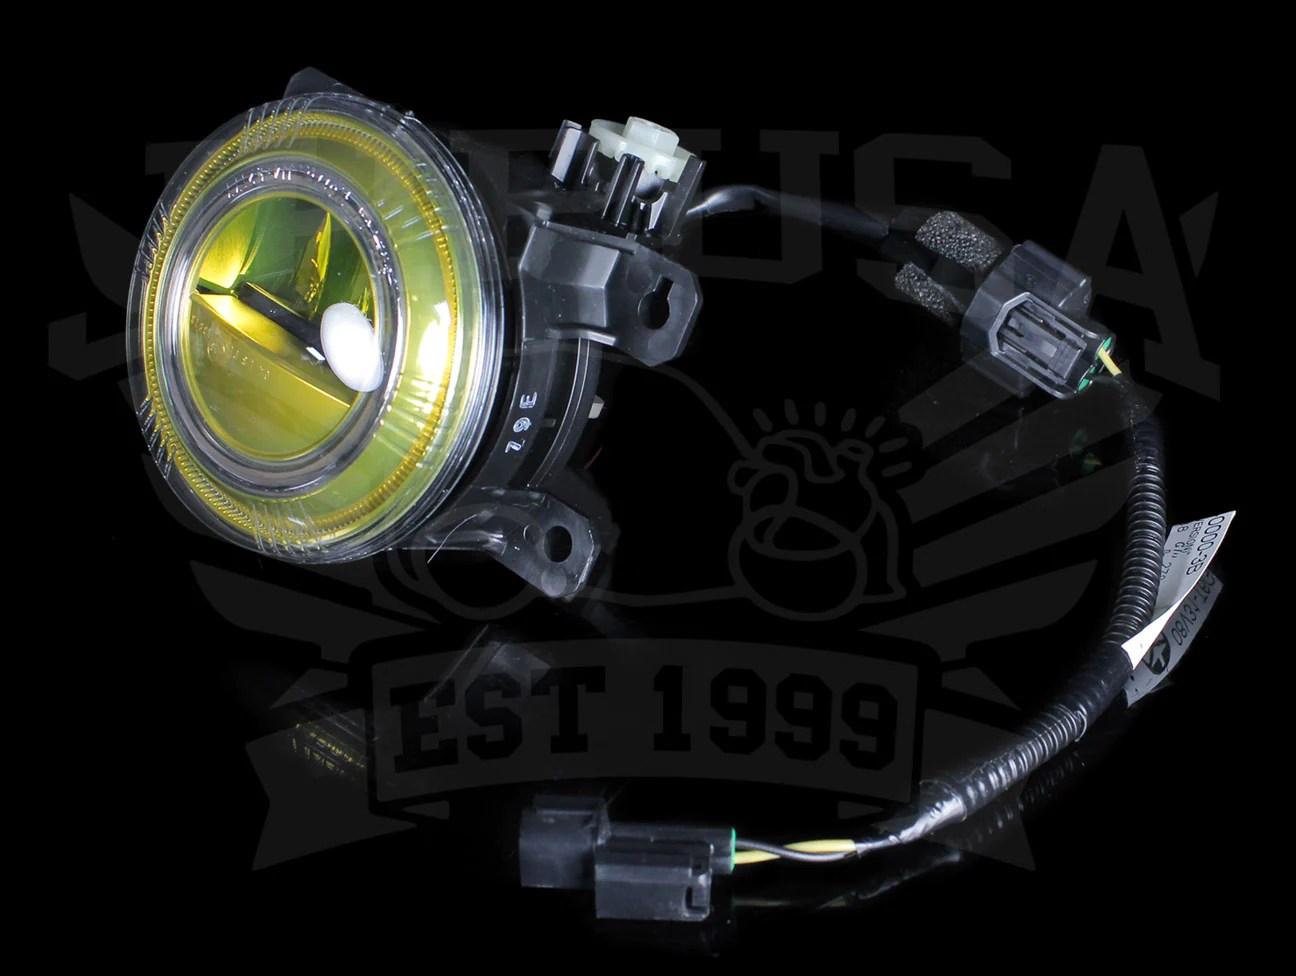 honda led fog light wire harness 2016 civic 2017 civic type  [ 1296 x 976 Pixel ]